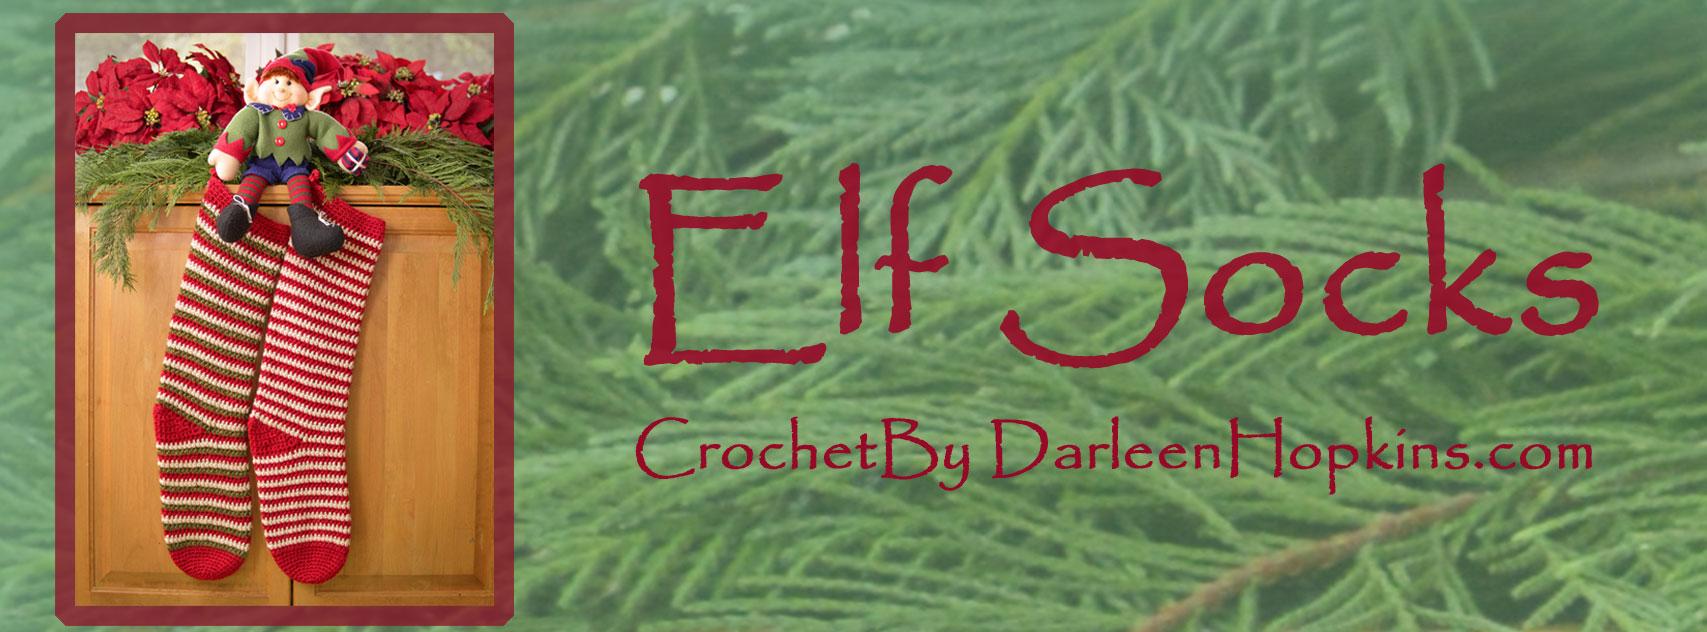 Christmas stocking crochet pattern by Darleen Hopkins